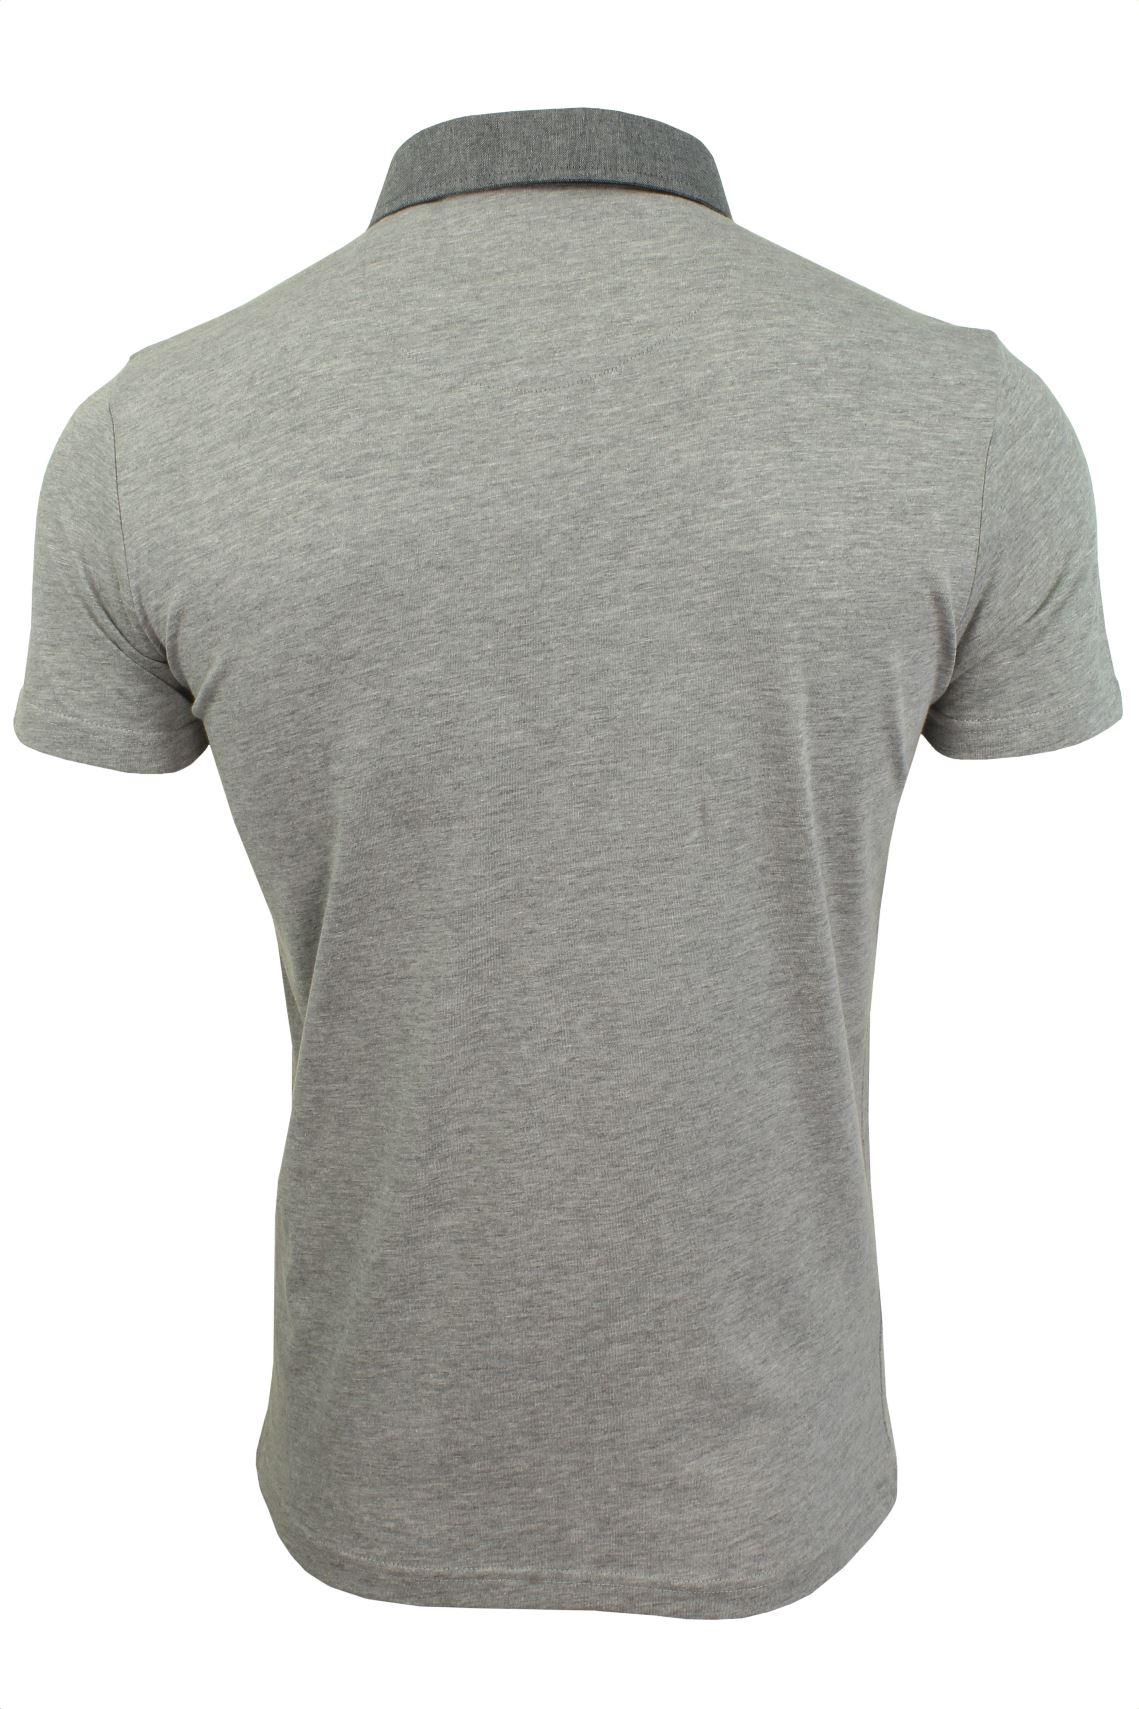 Mens-Polo-T-Shirt-Chimera-Brave-Soul-Denim-Chambray-Collar-Short-Sleeved-Cotton thumbnail 21